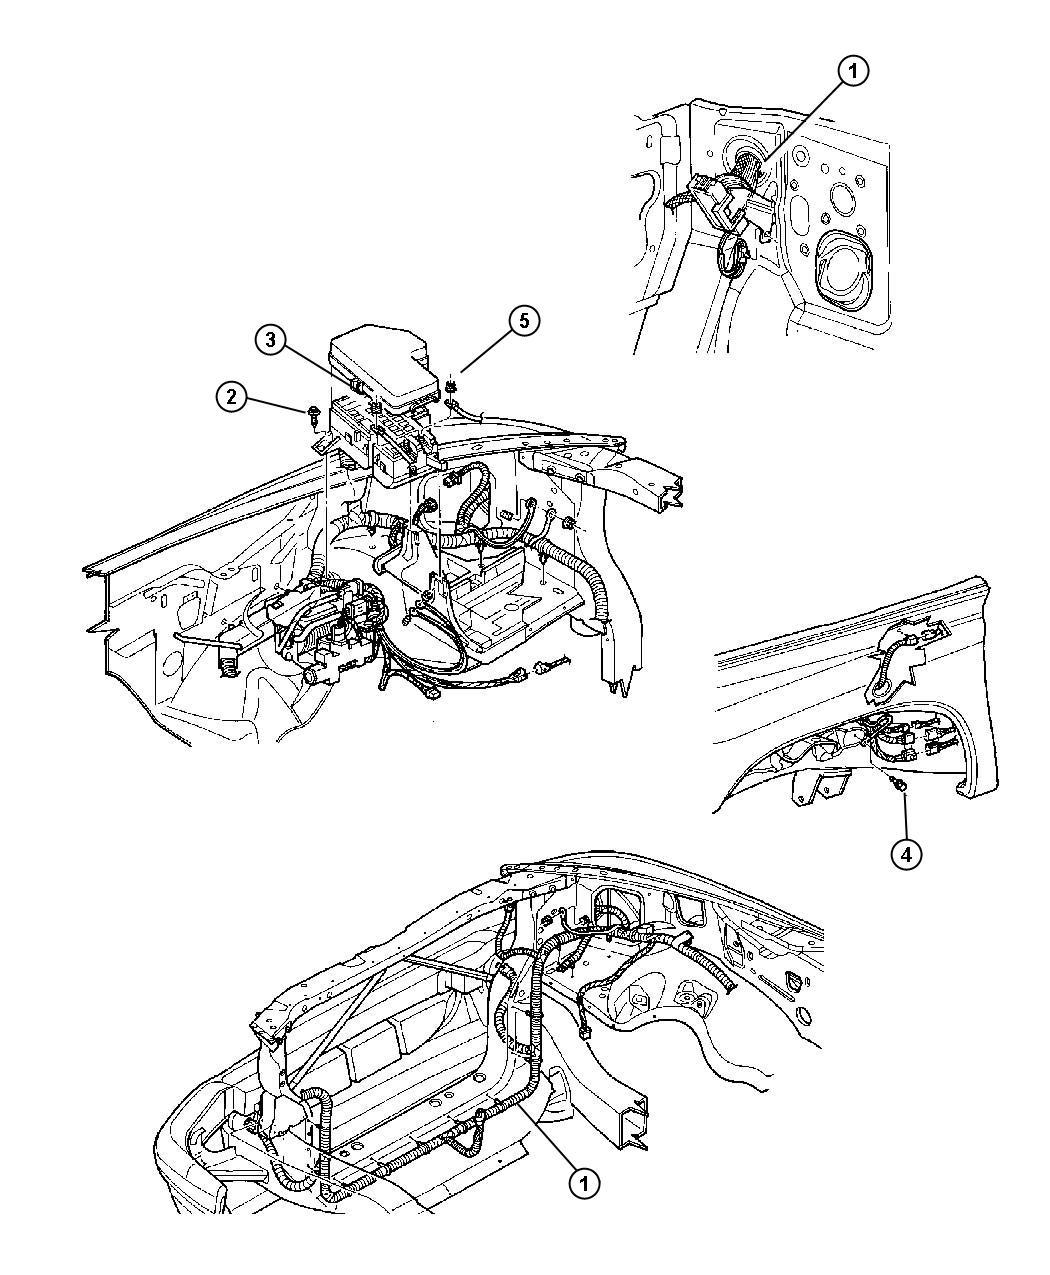 hight resolution of  2010 dodge ram 3500 fuse box diagram on lexus rx 350 parts diagram html